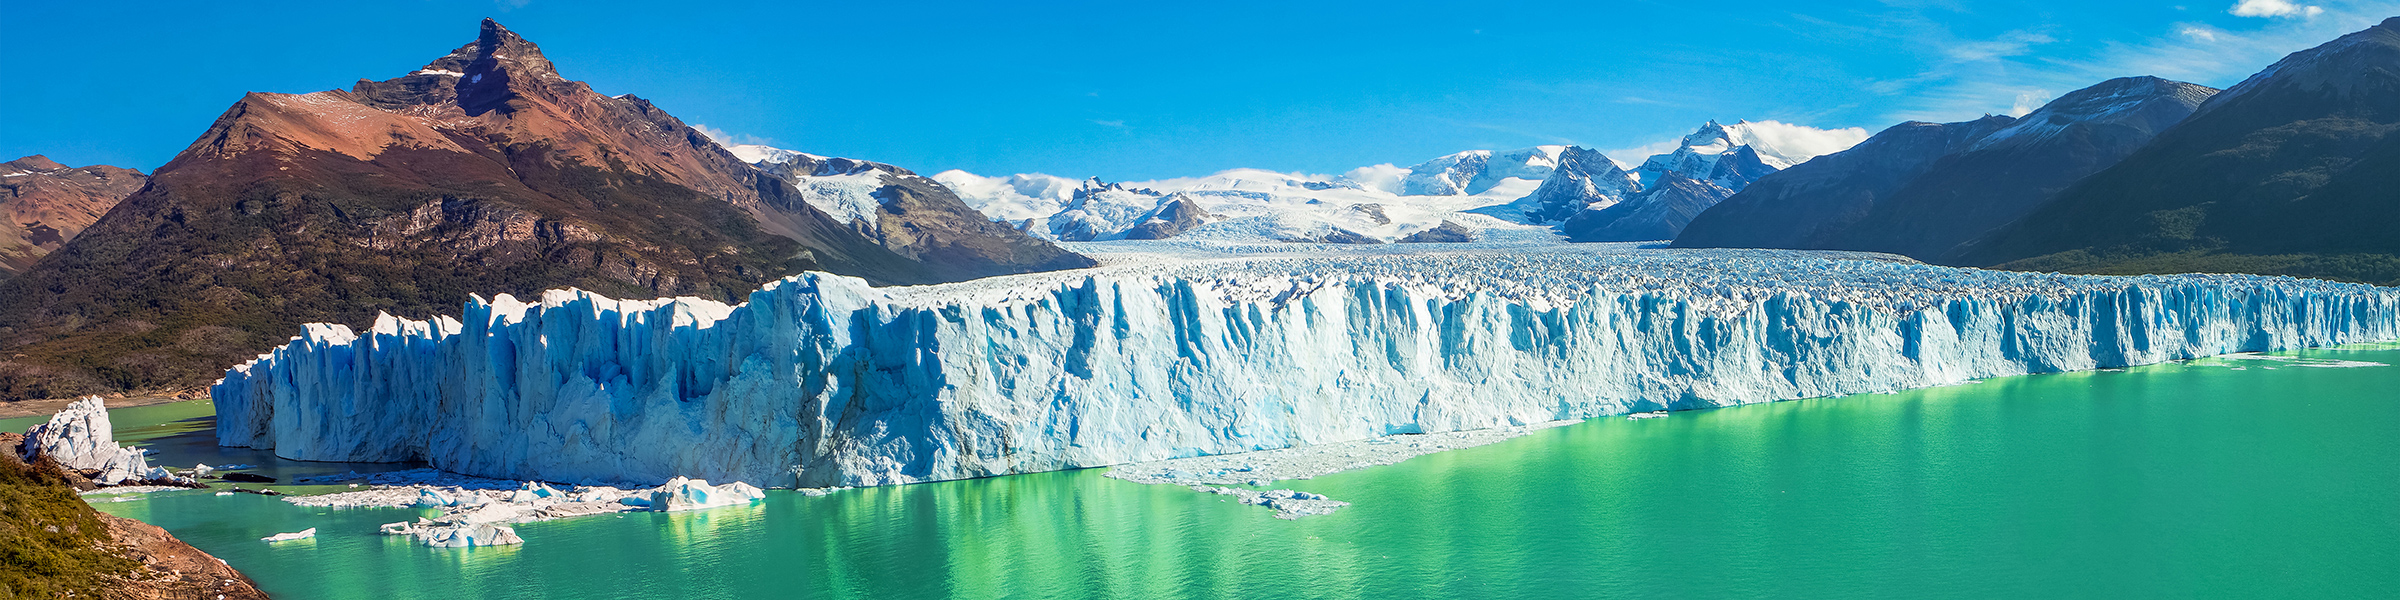 Argentina Patagonia Perito Moreno Glacier